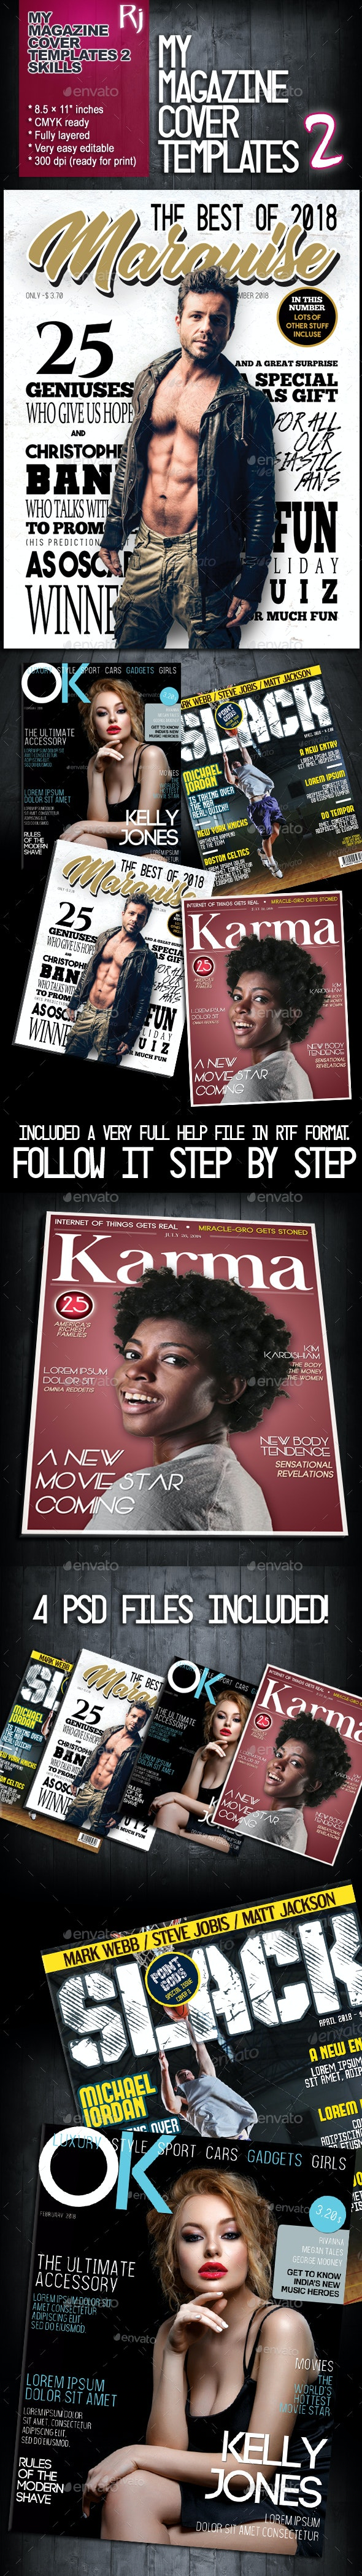 My Magazine Cover Templates 2 - Magazines Print Templates